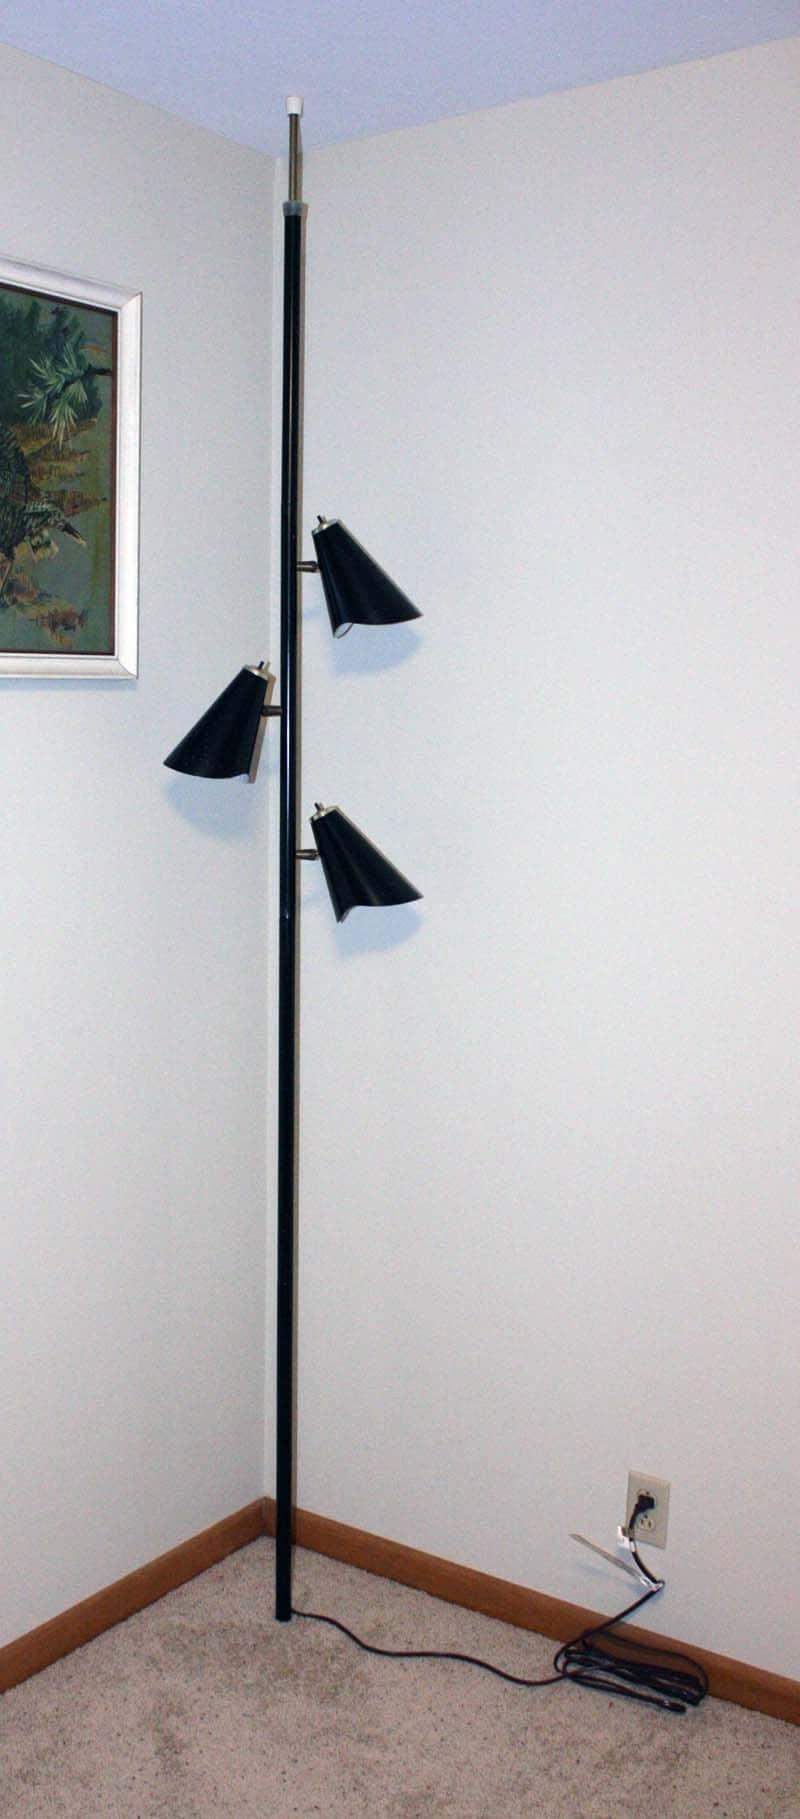 Vintage Lamp Pole Lamp Tension Pole Lamp Black By